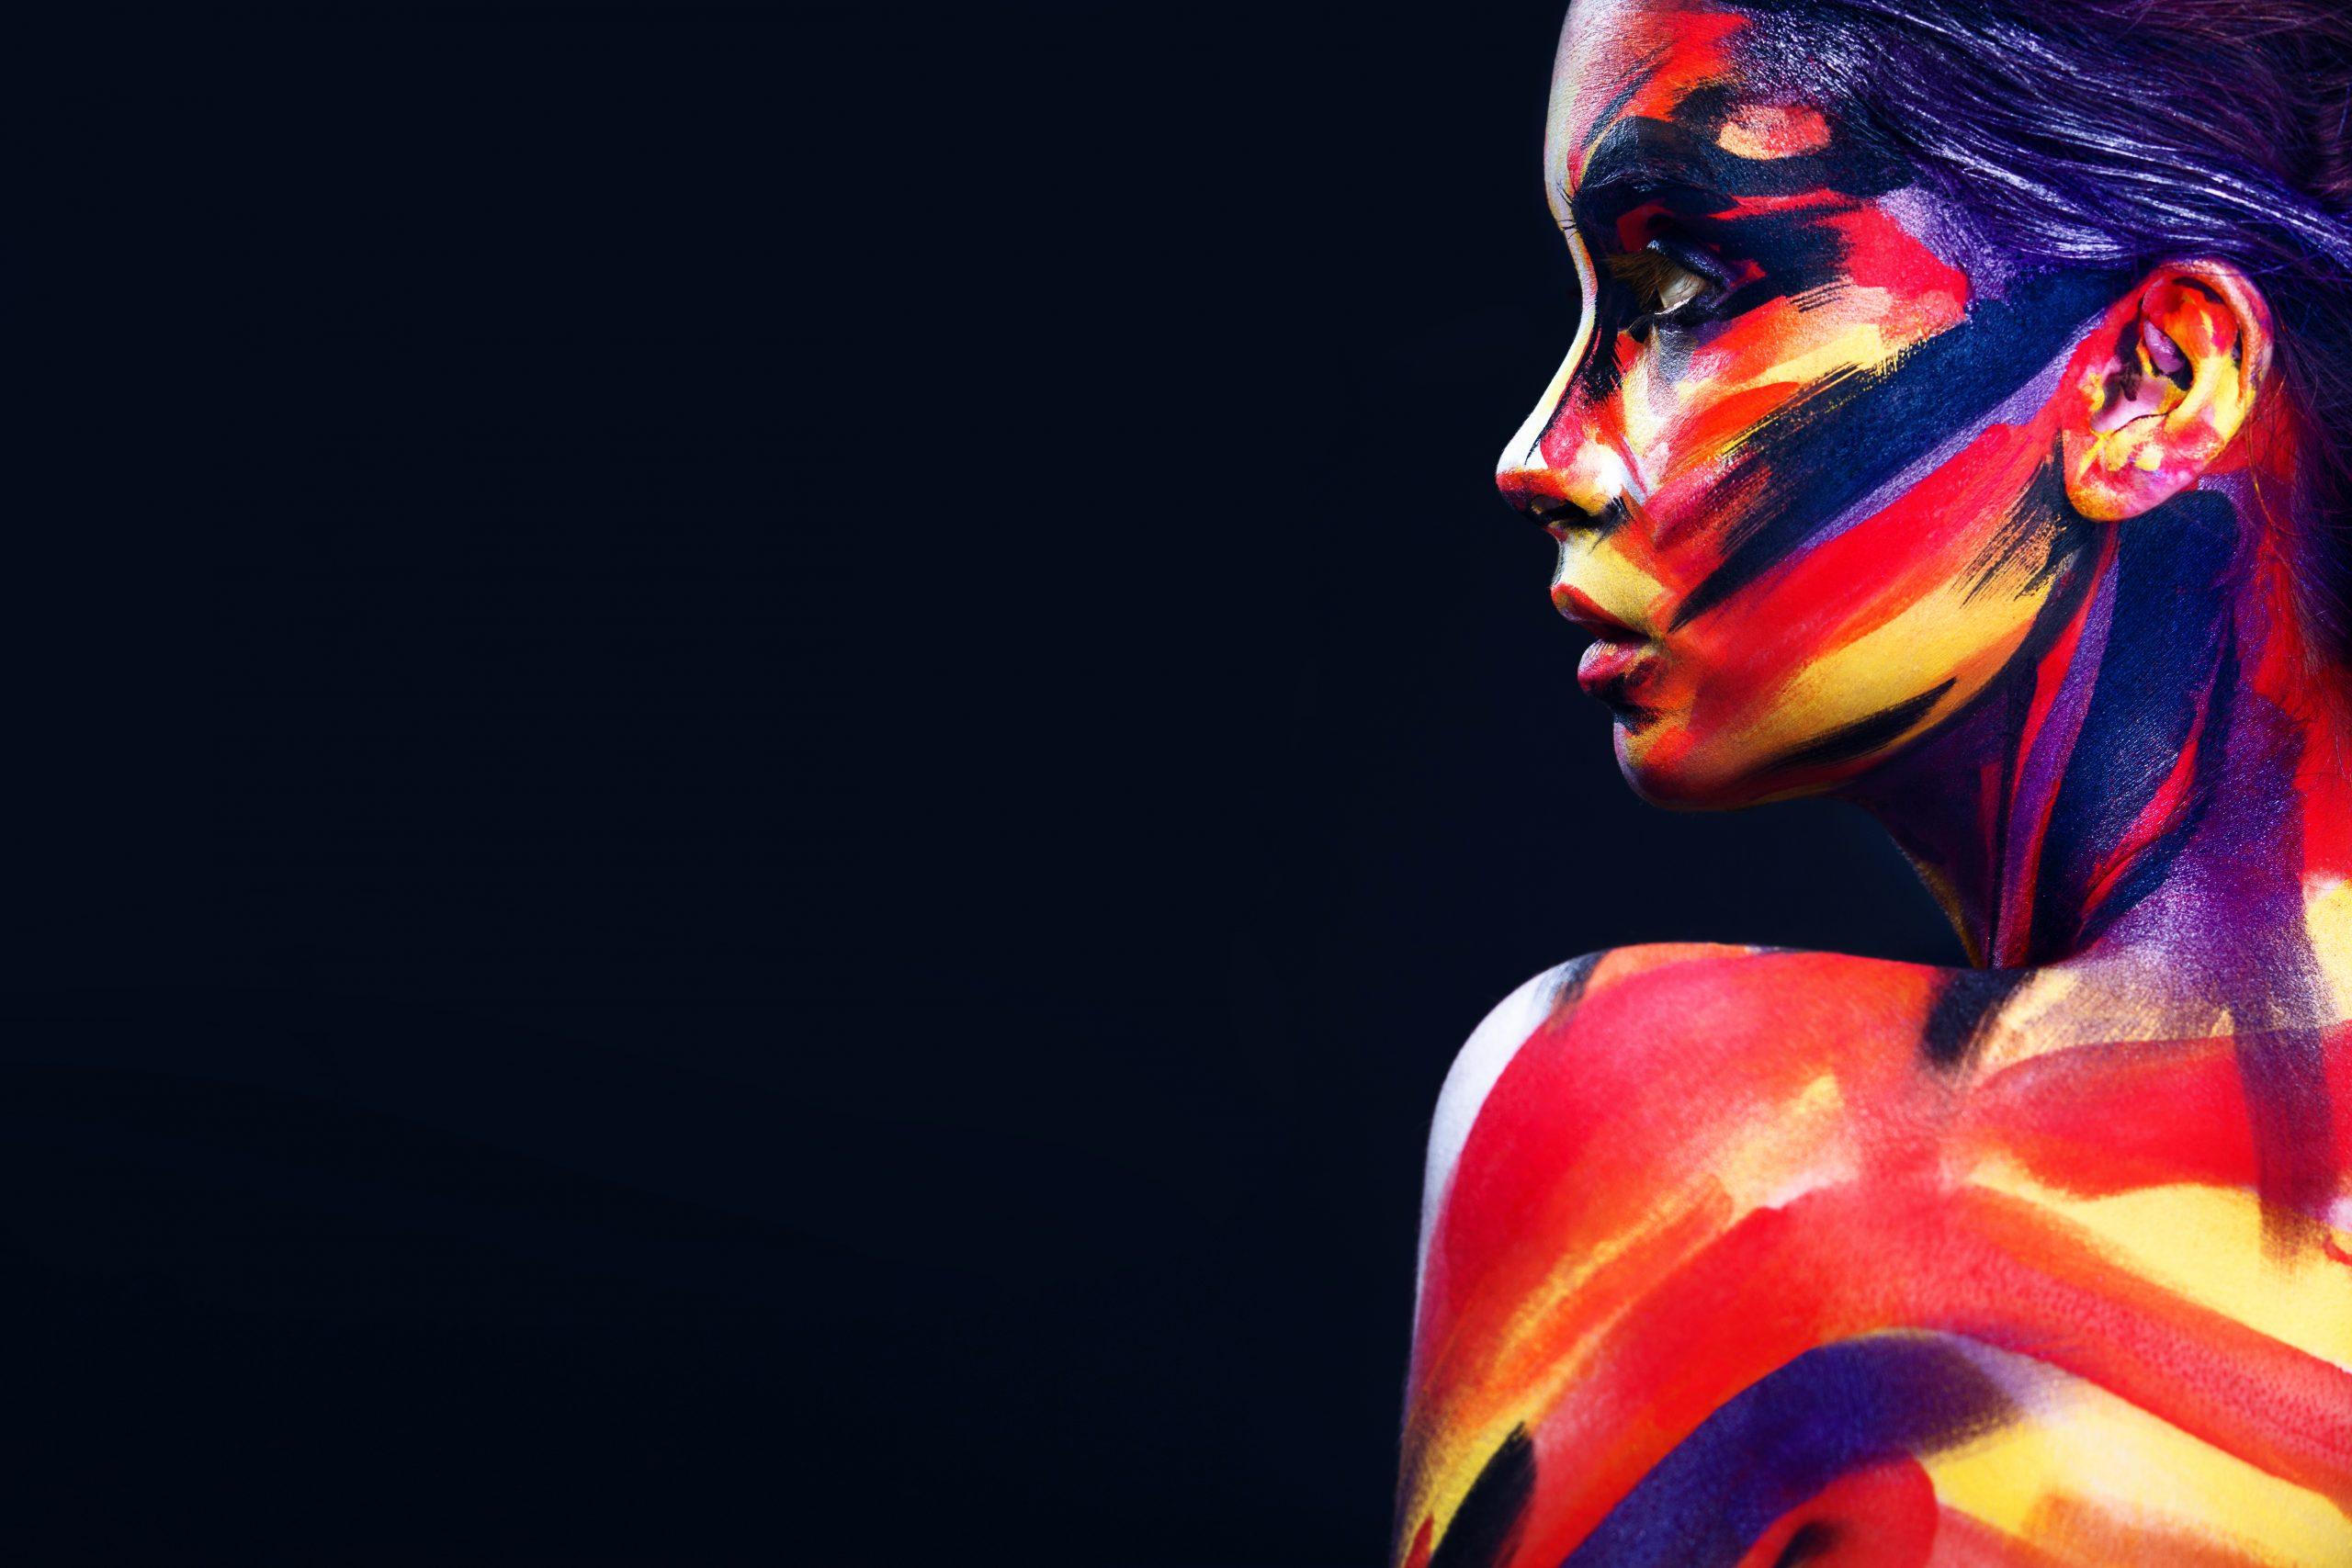 Body-Art Woman | Jack R. Hayes